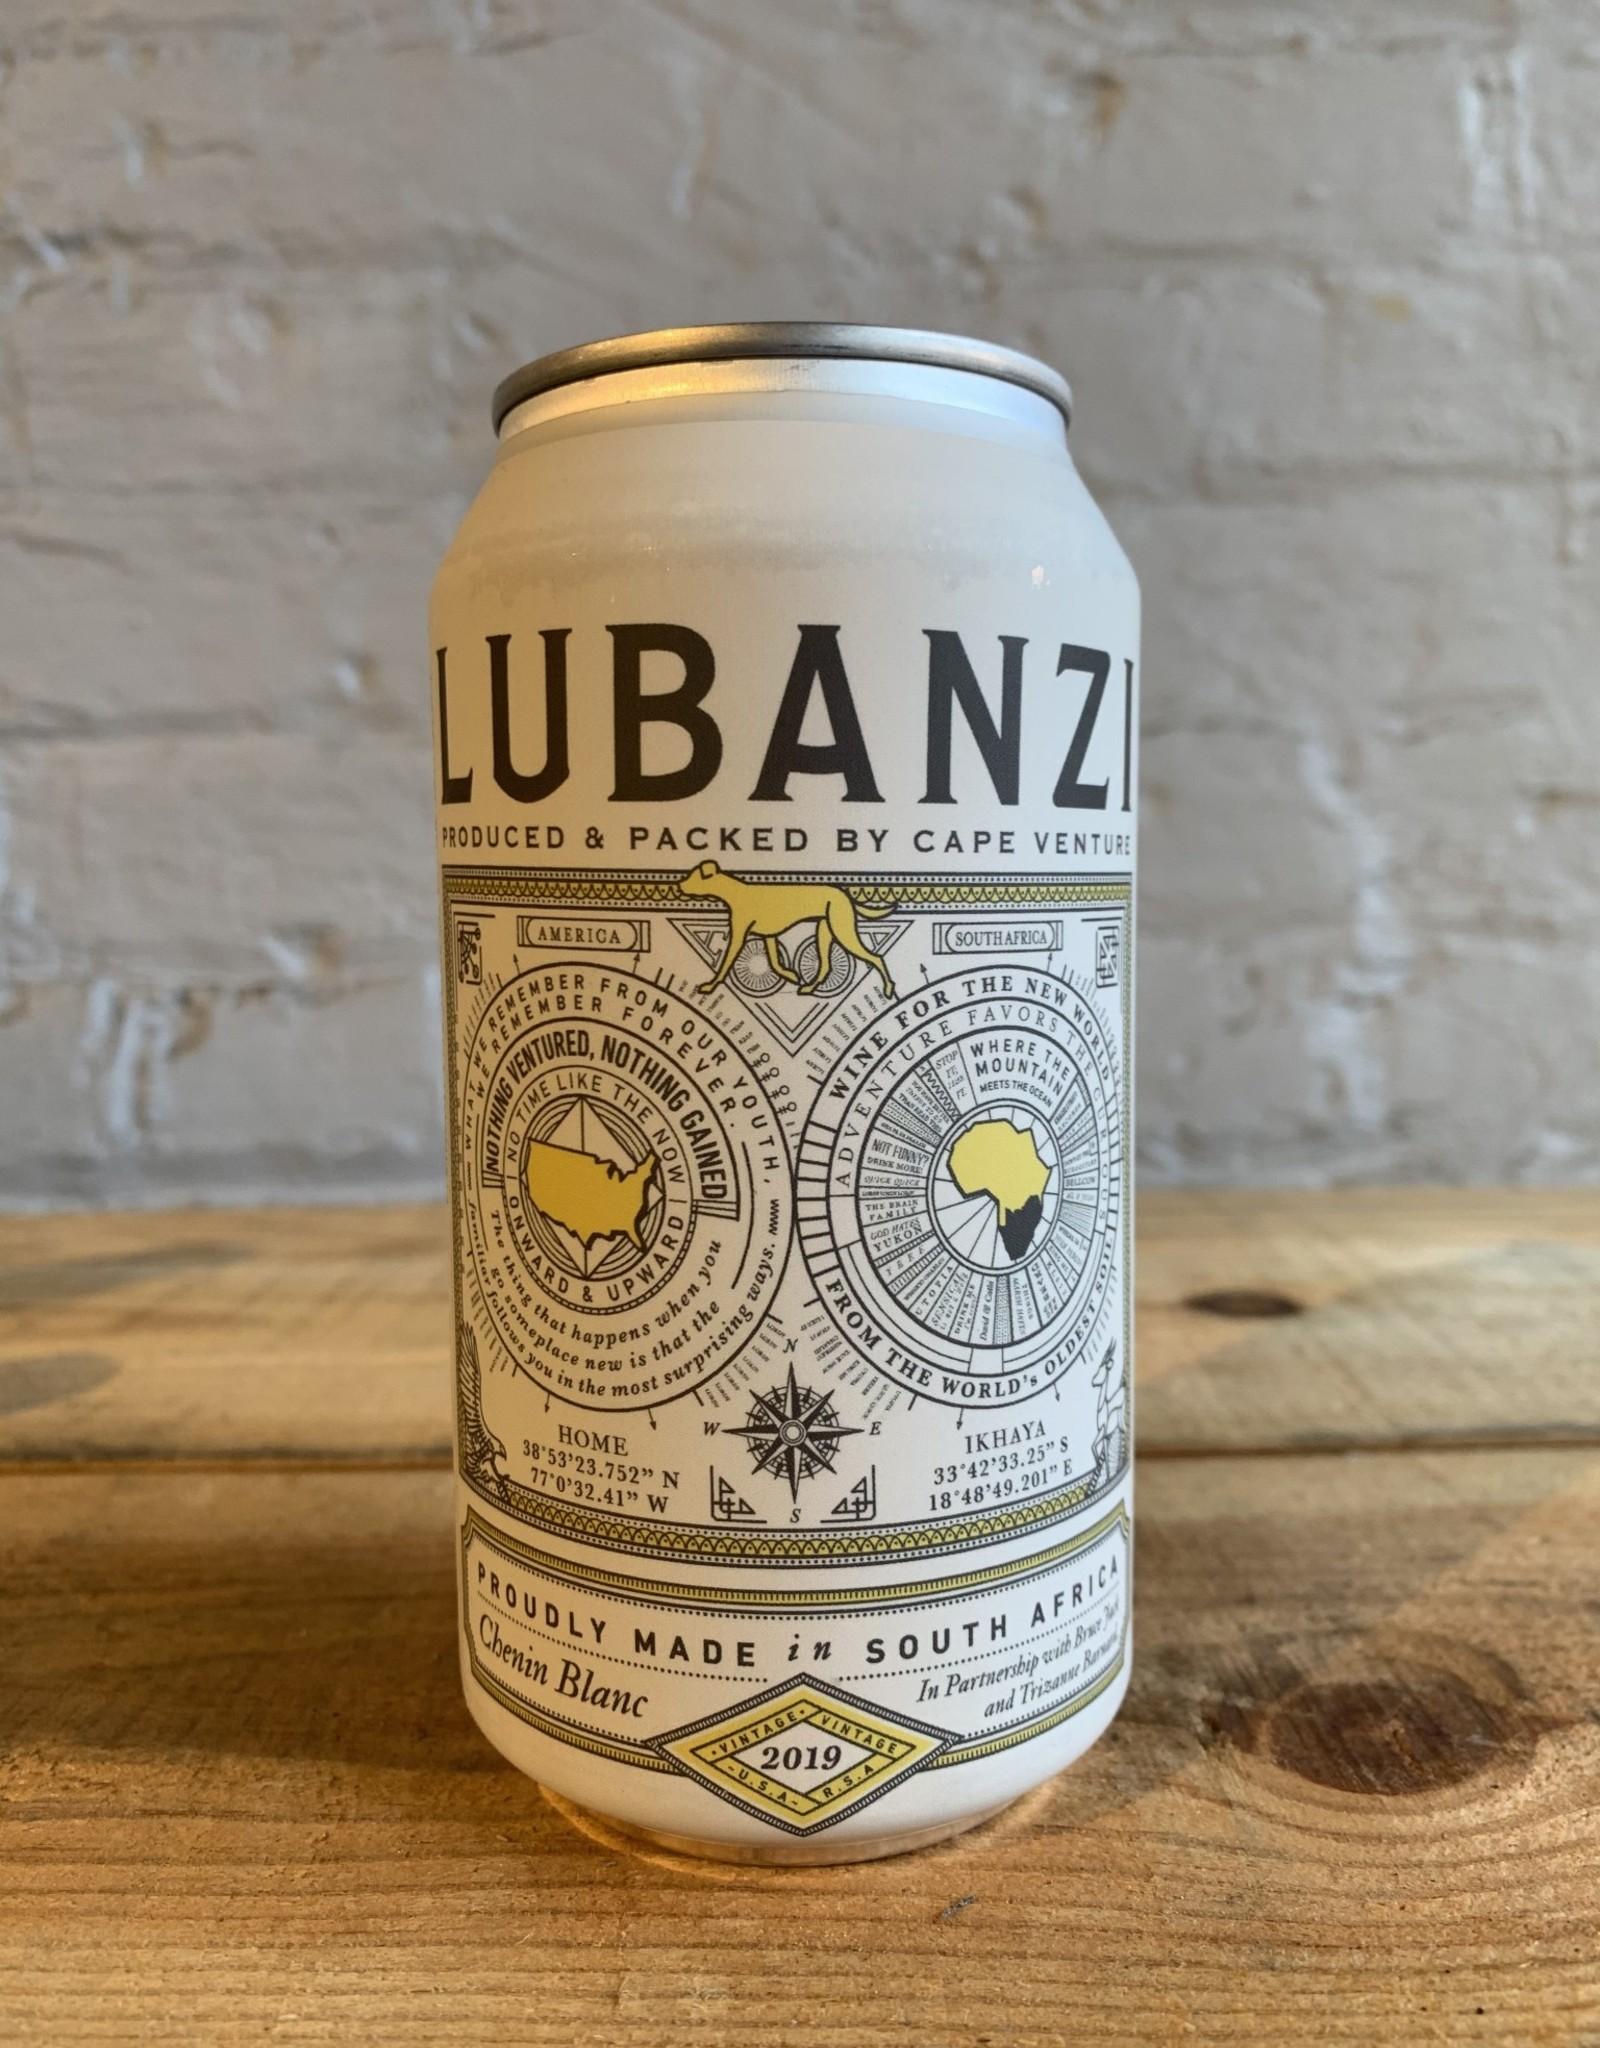 Wine 2019 Lubanzi Chenin Blanc - Swartland, Western Cape, South Africa (375ml can)